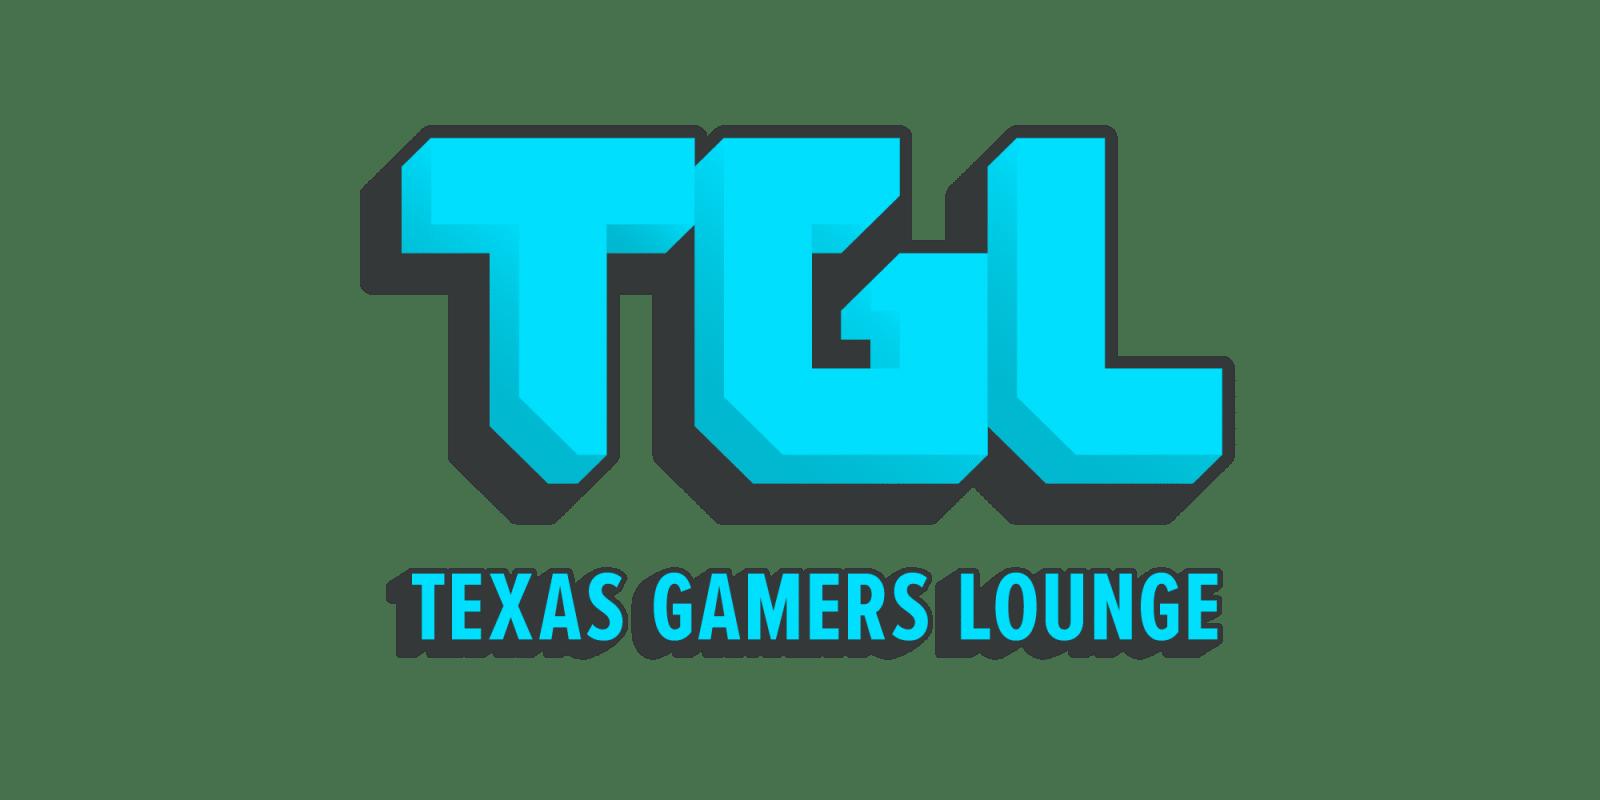 TGL - Texas Gamers Lounge Logo